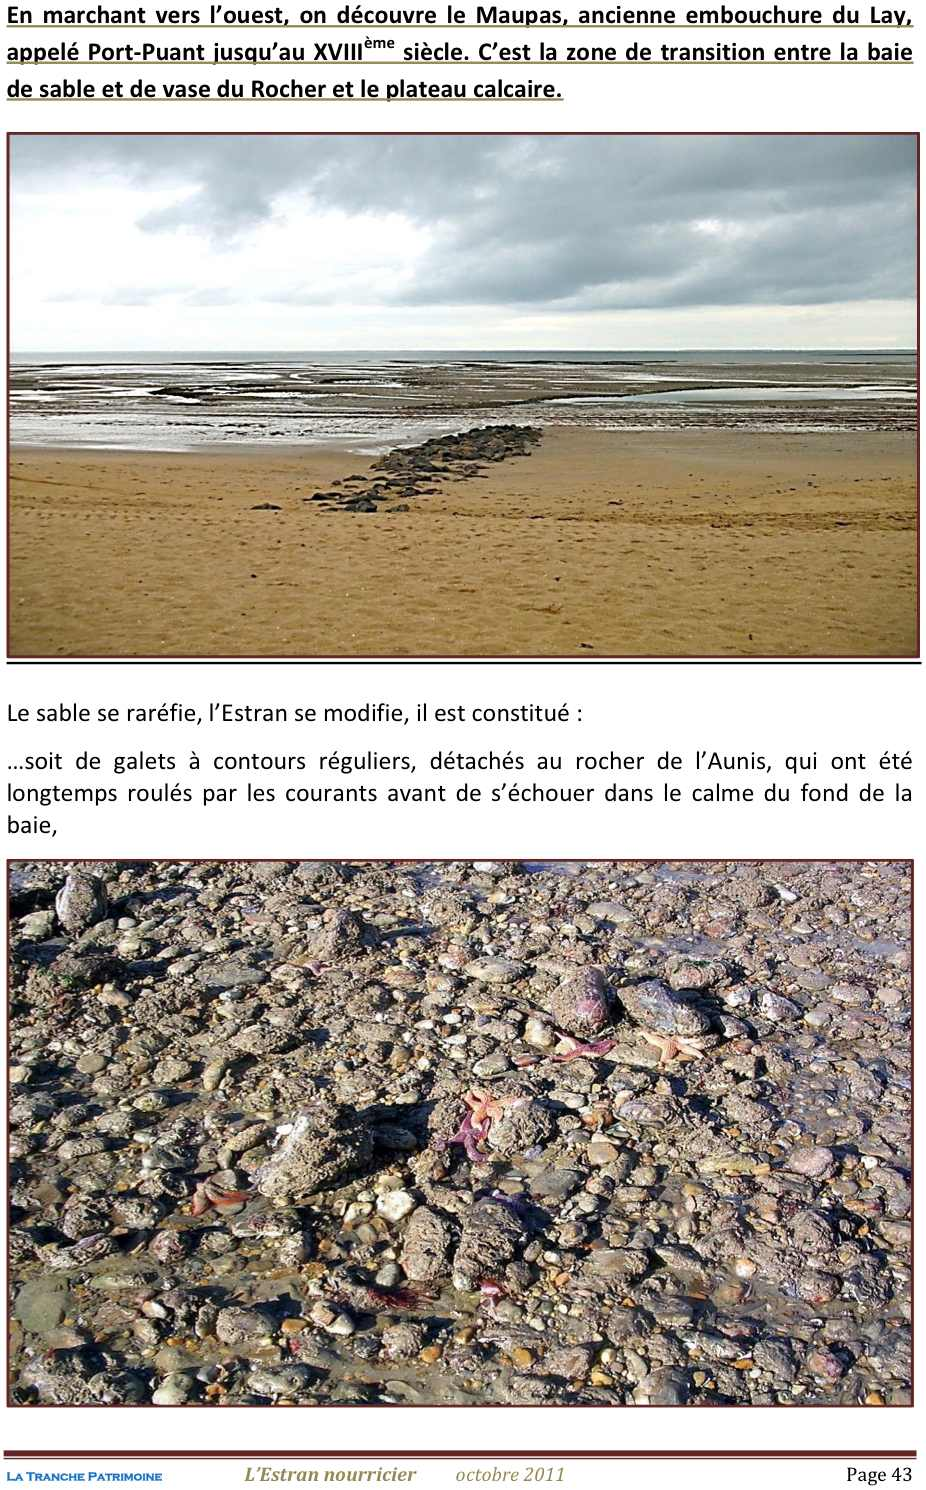 Lestran Nourricier 43 jpeg1.jpg